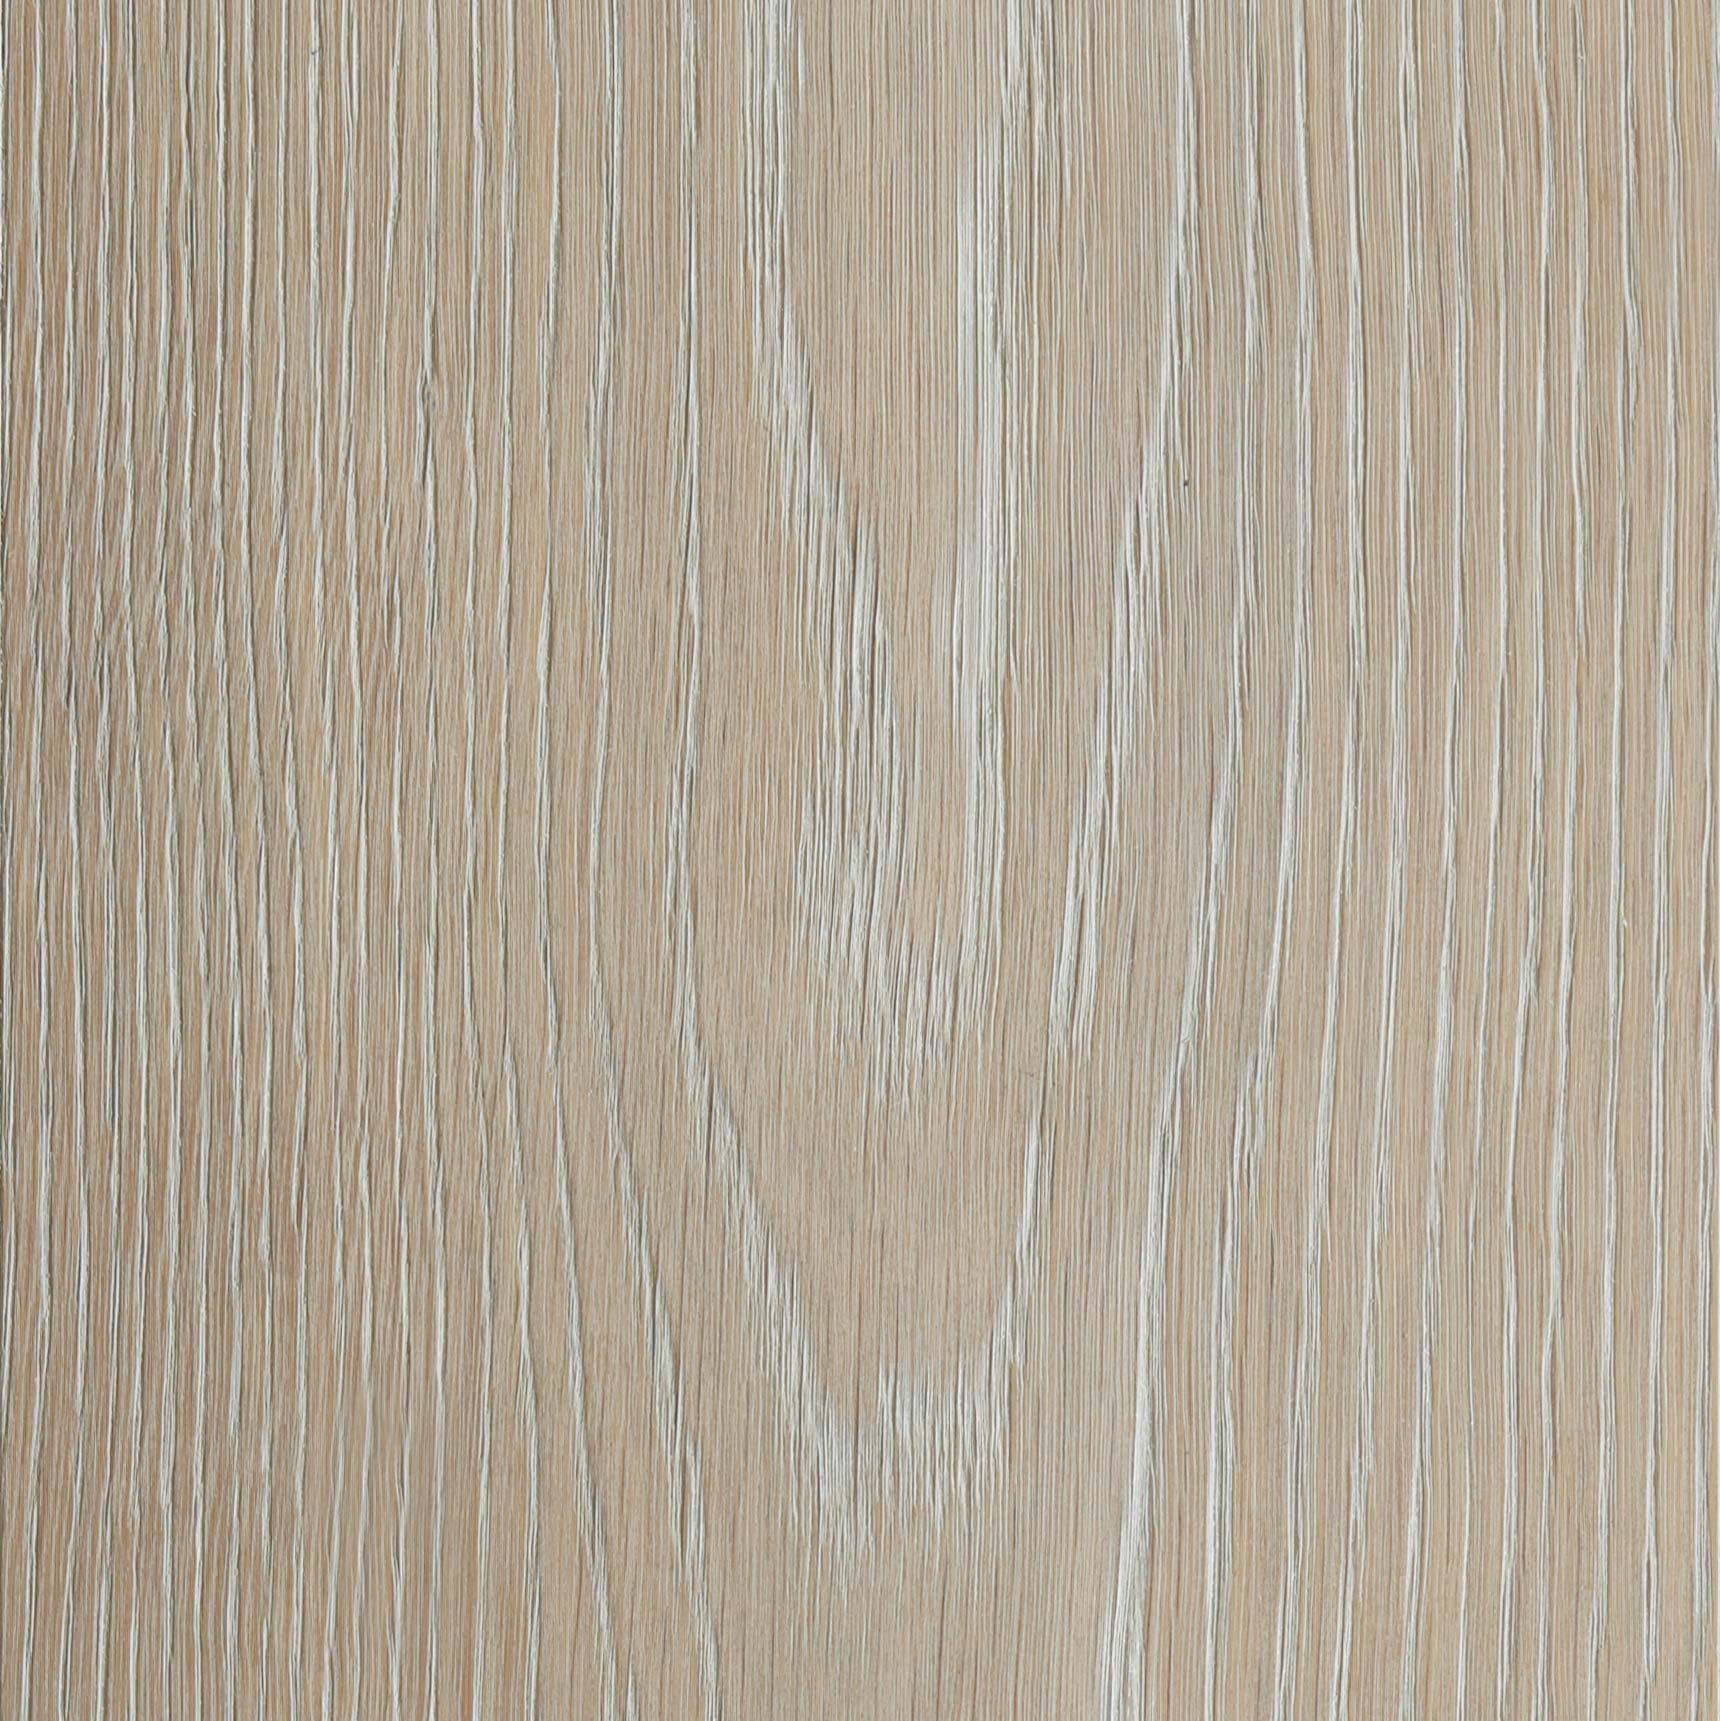 Element7-wide-plank-samples-WashedOak_WhiteOil_brushed_AJ_562_094-copy_